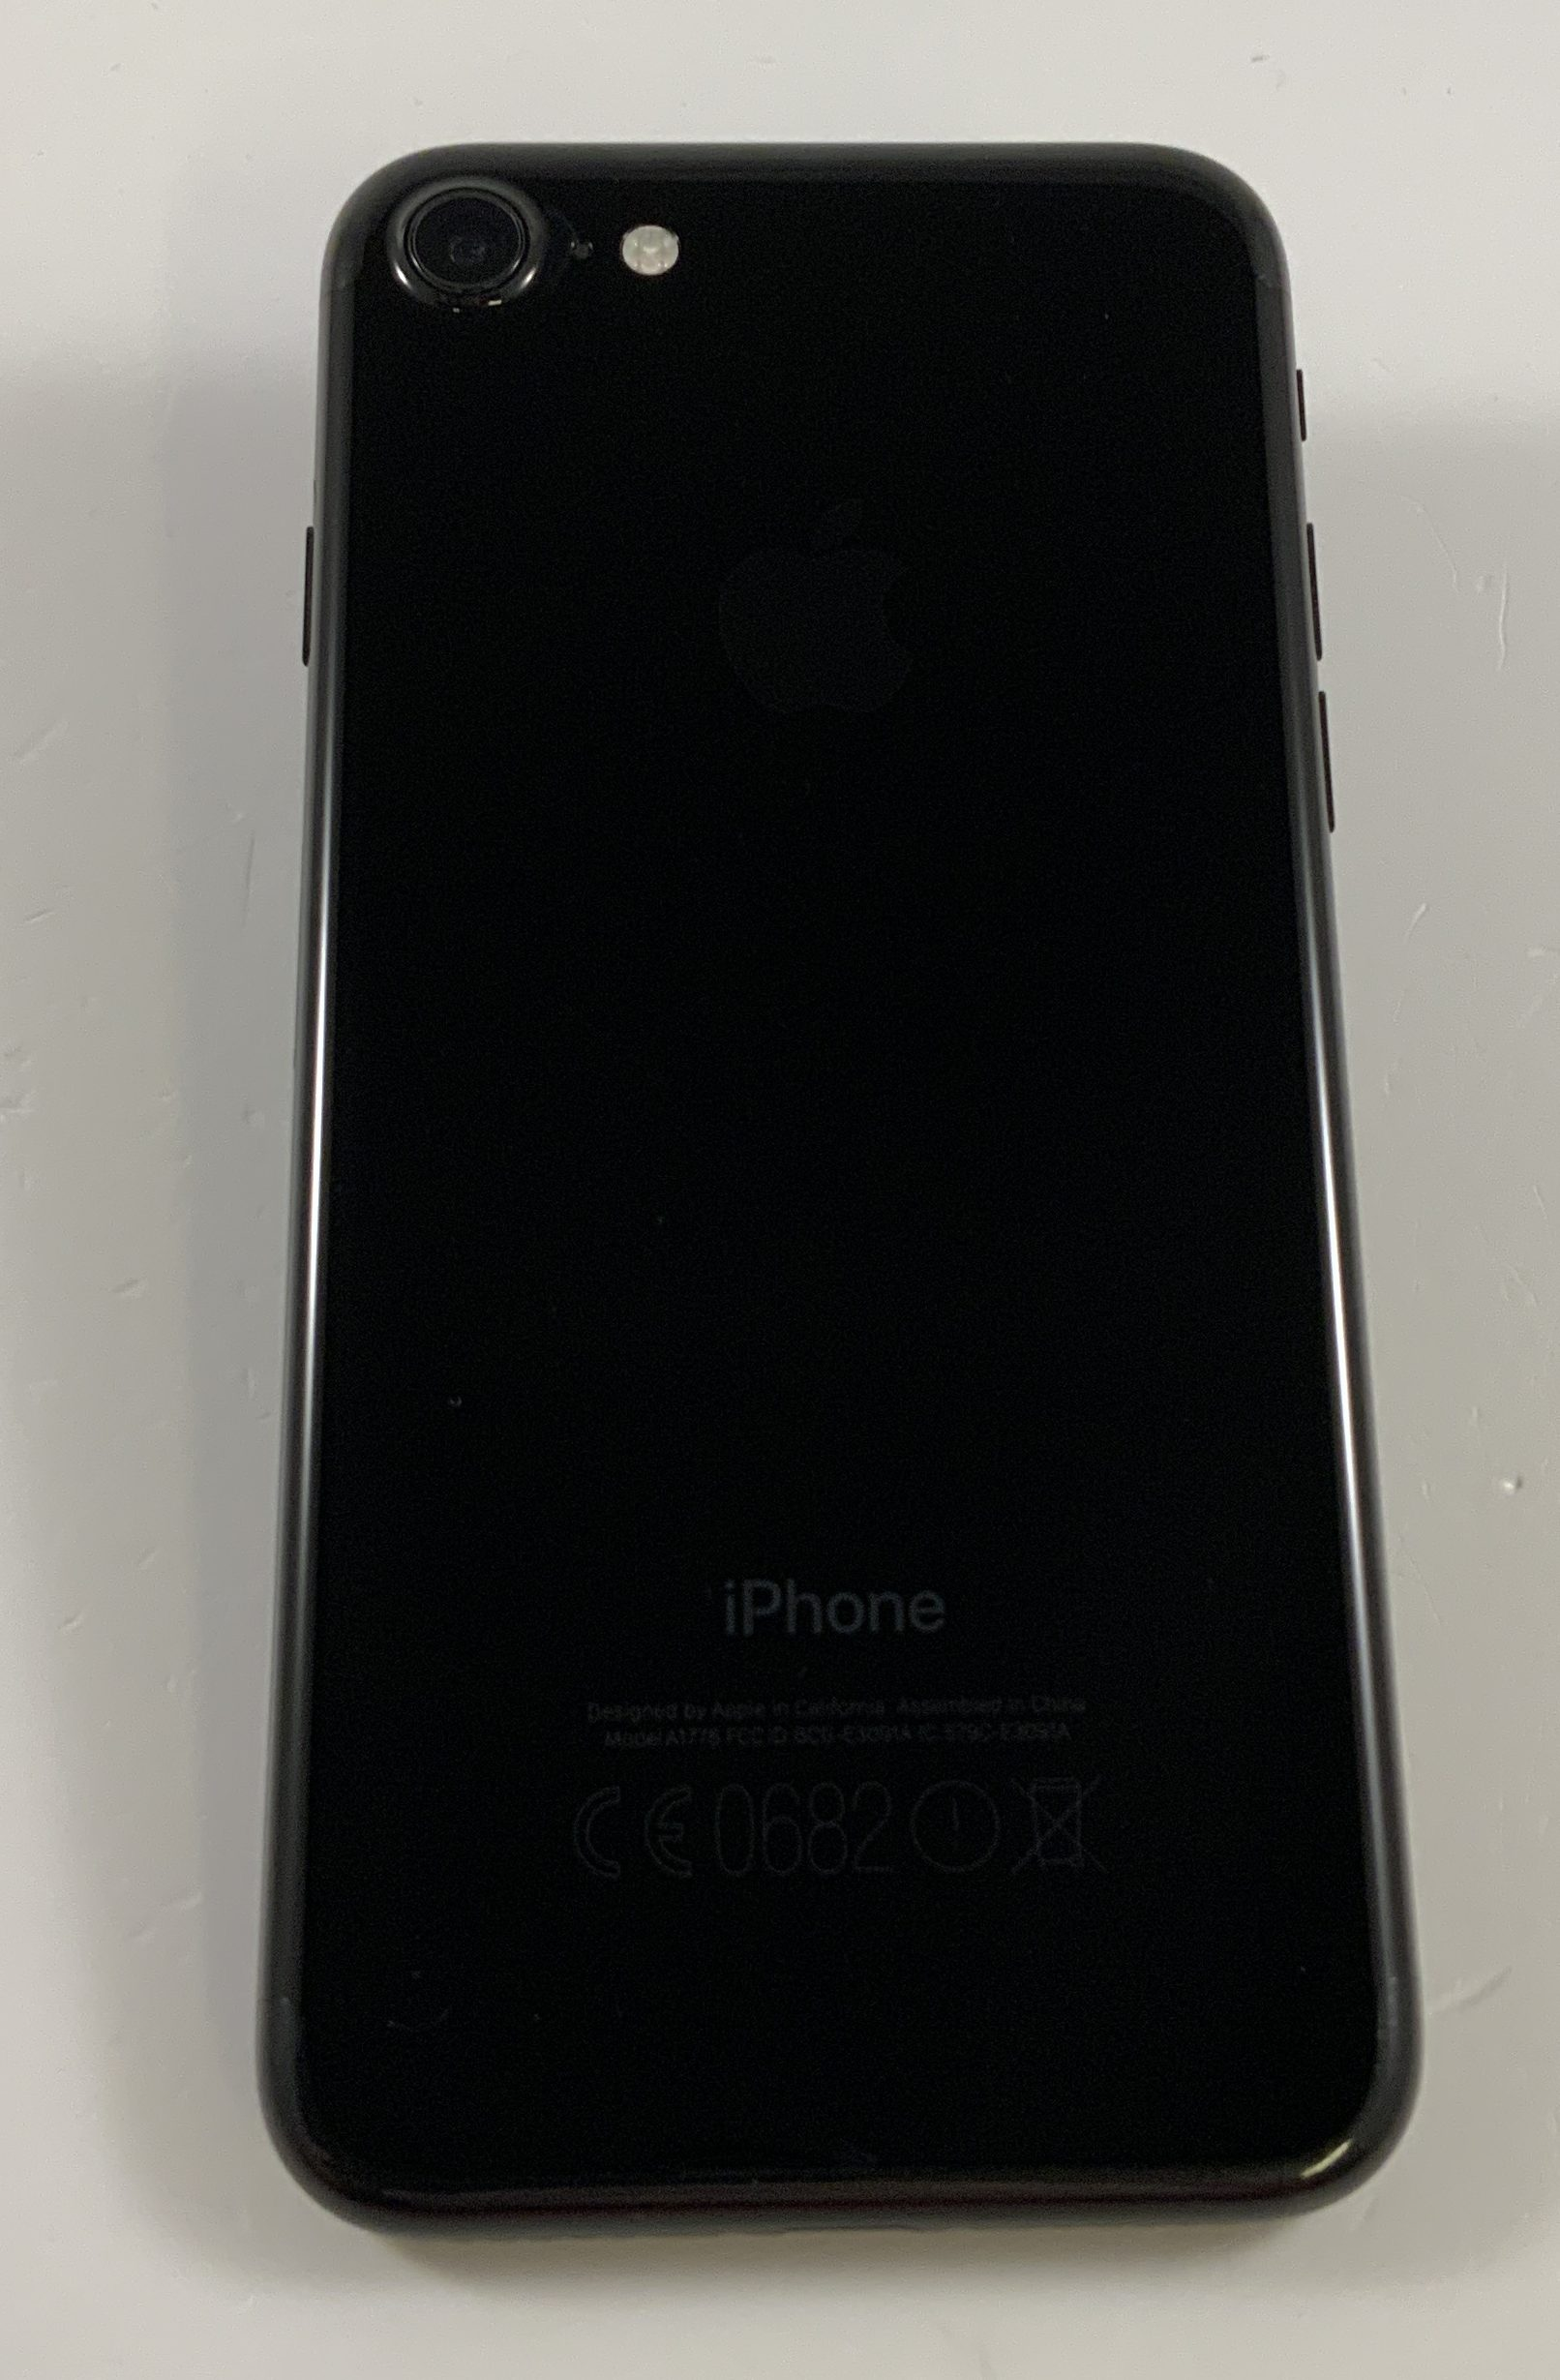 iPhone 7 32GB, 32GB, Jet Black, immagine 2